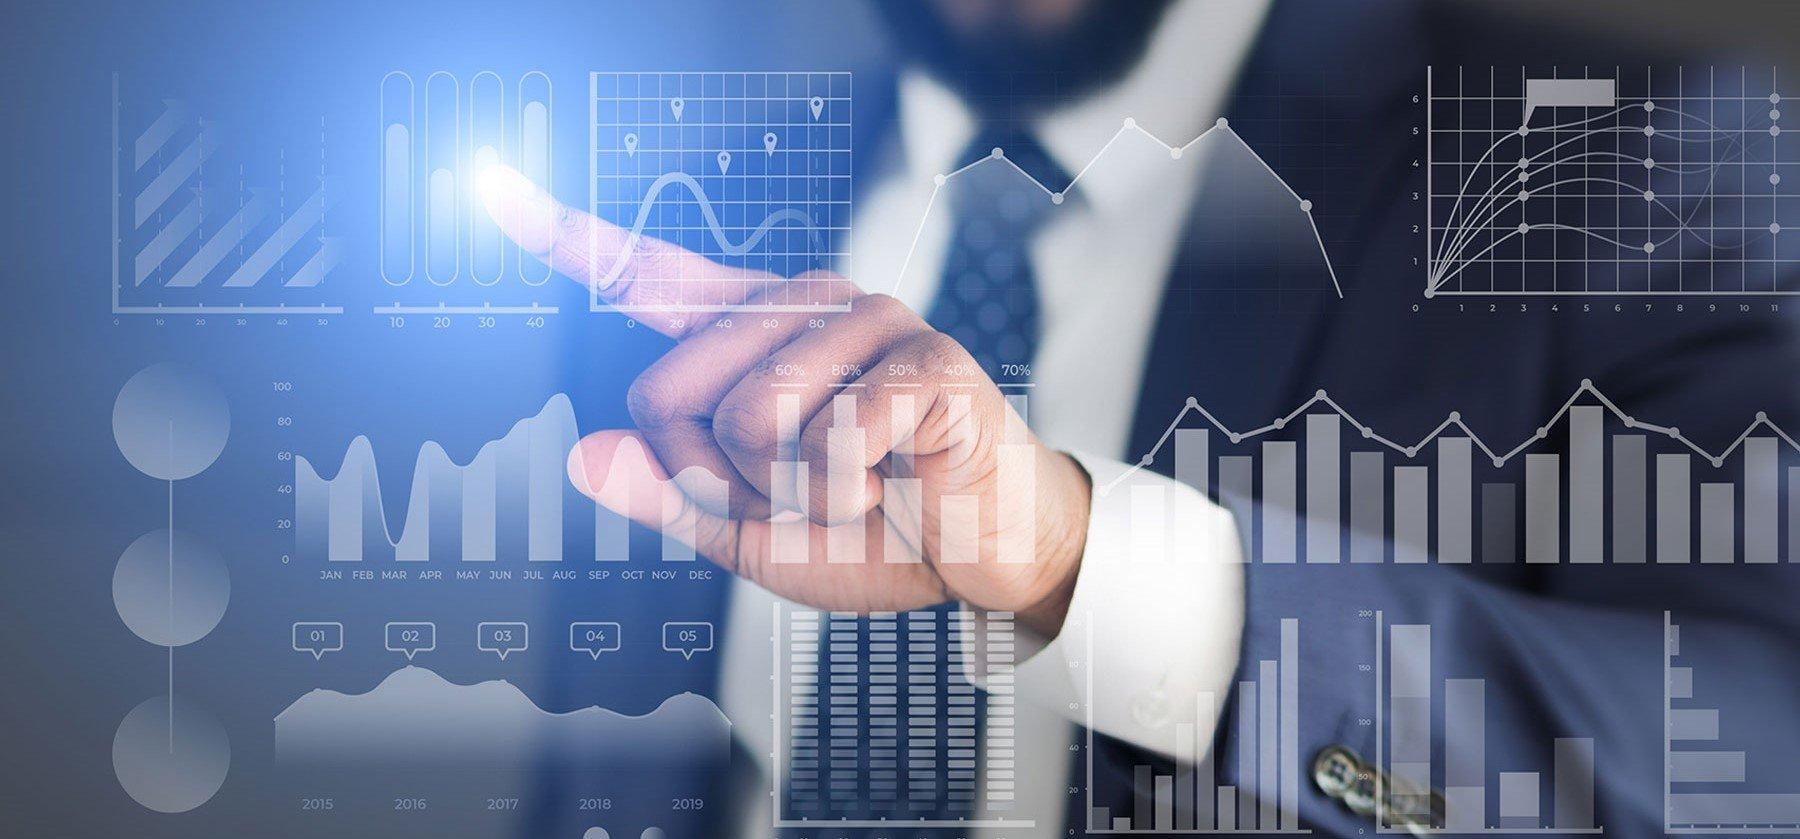 Data monetization - increase the value of master data